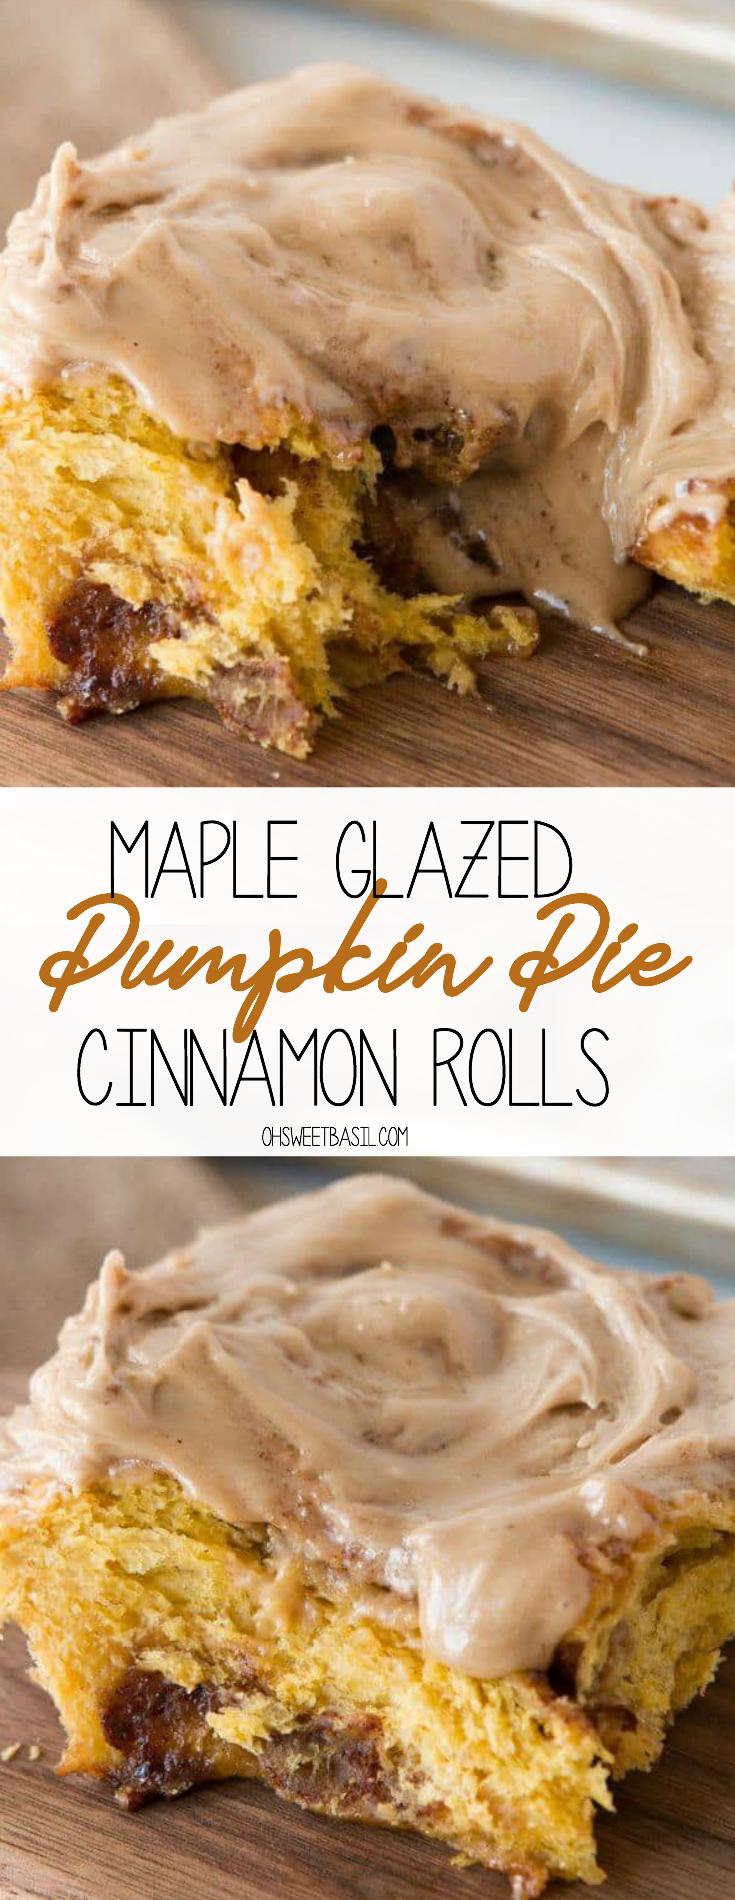 A maple glazed pumpkin pie cinnamon roll with a bite taken out of it